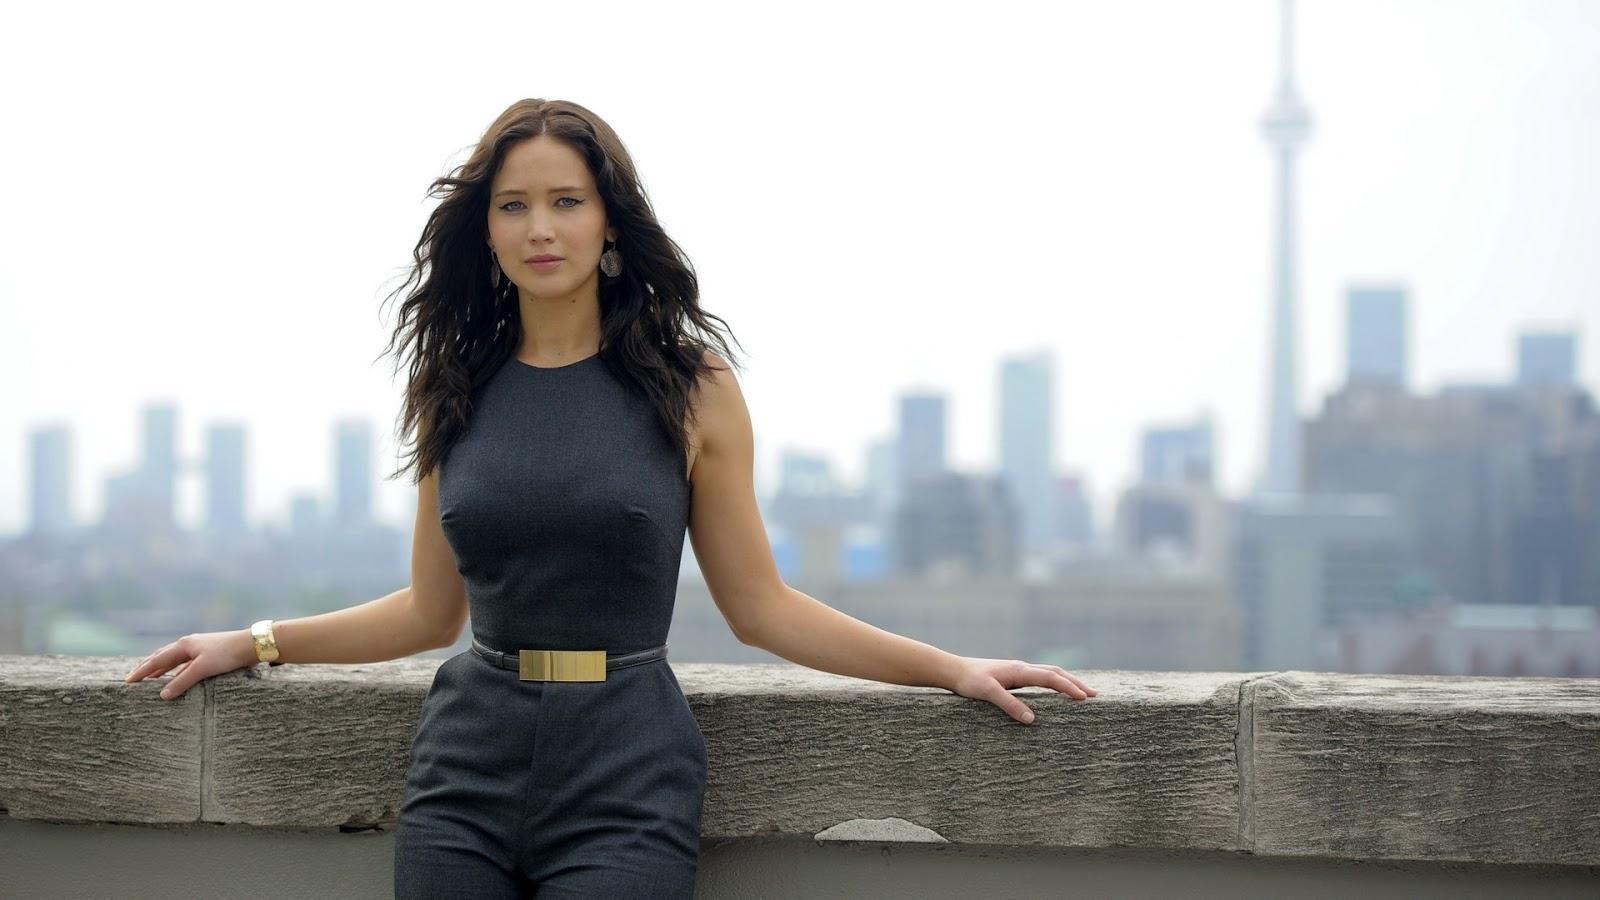 Jennifer lawrence hot wallpapers celebrity wallpapers - Celebrity background ...